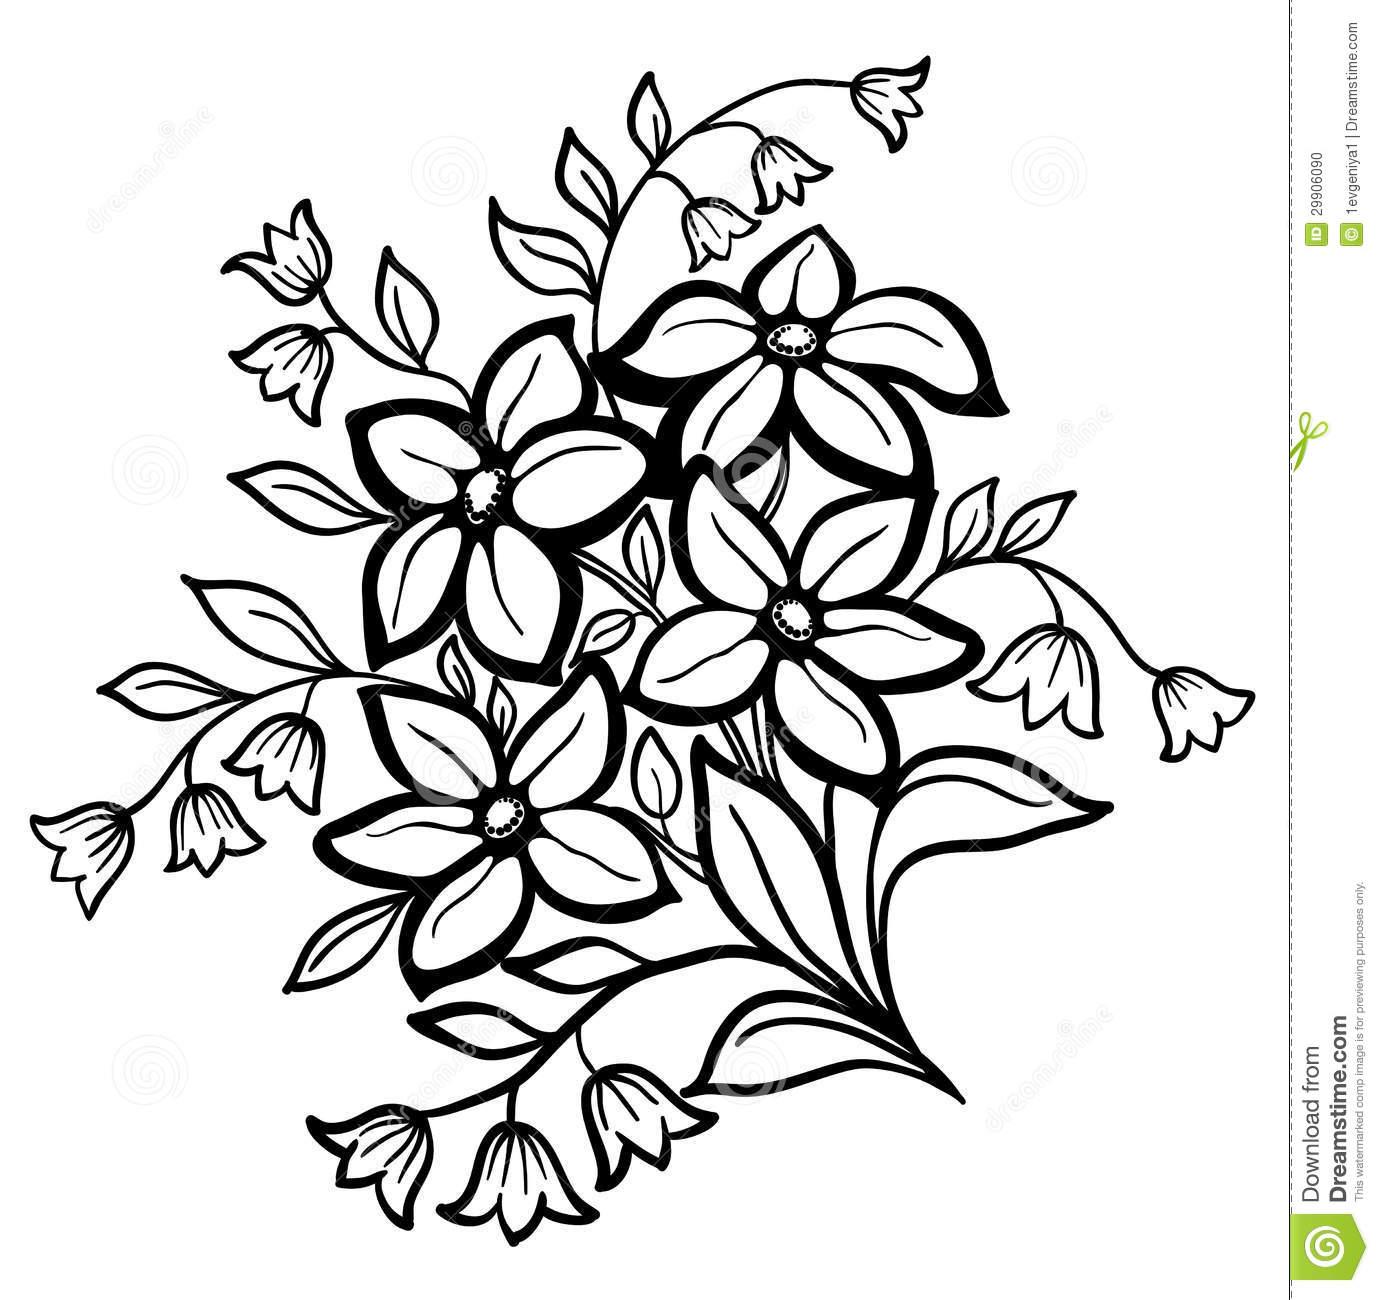 1379x1300 Outline Drawing Of Flowers Flower Arrangement, A Black Outline